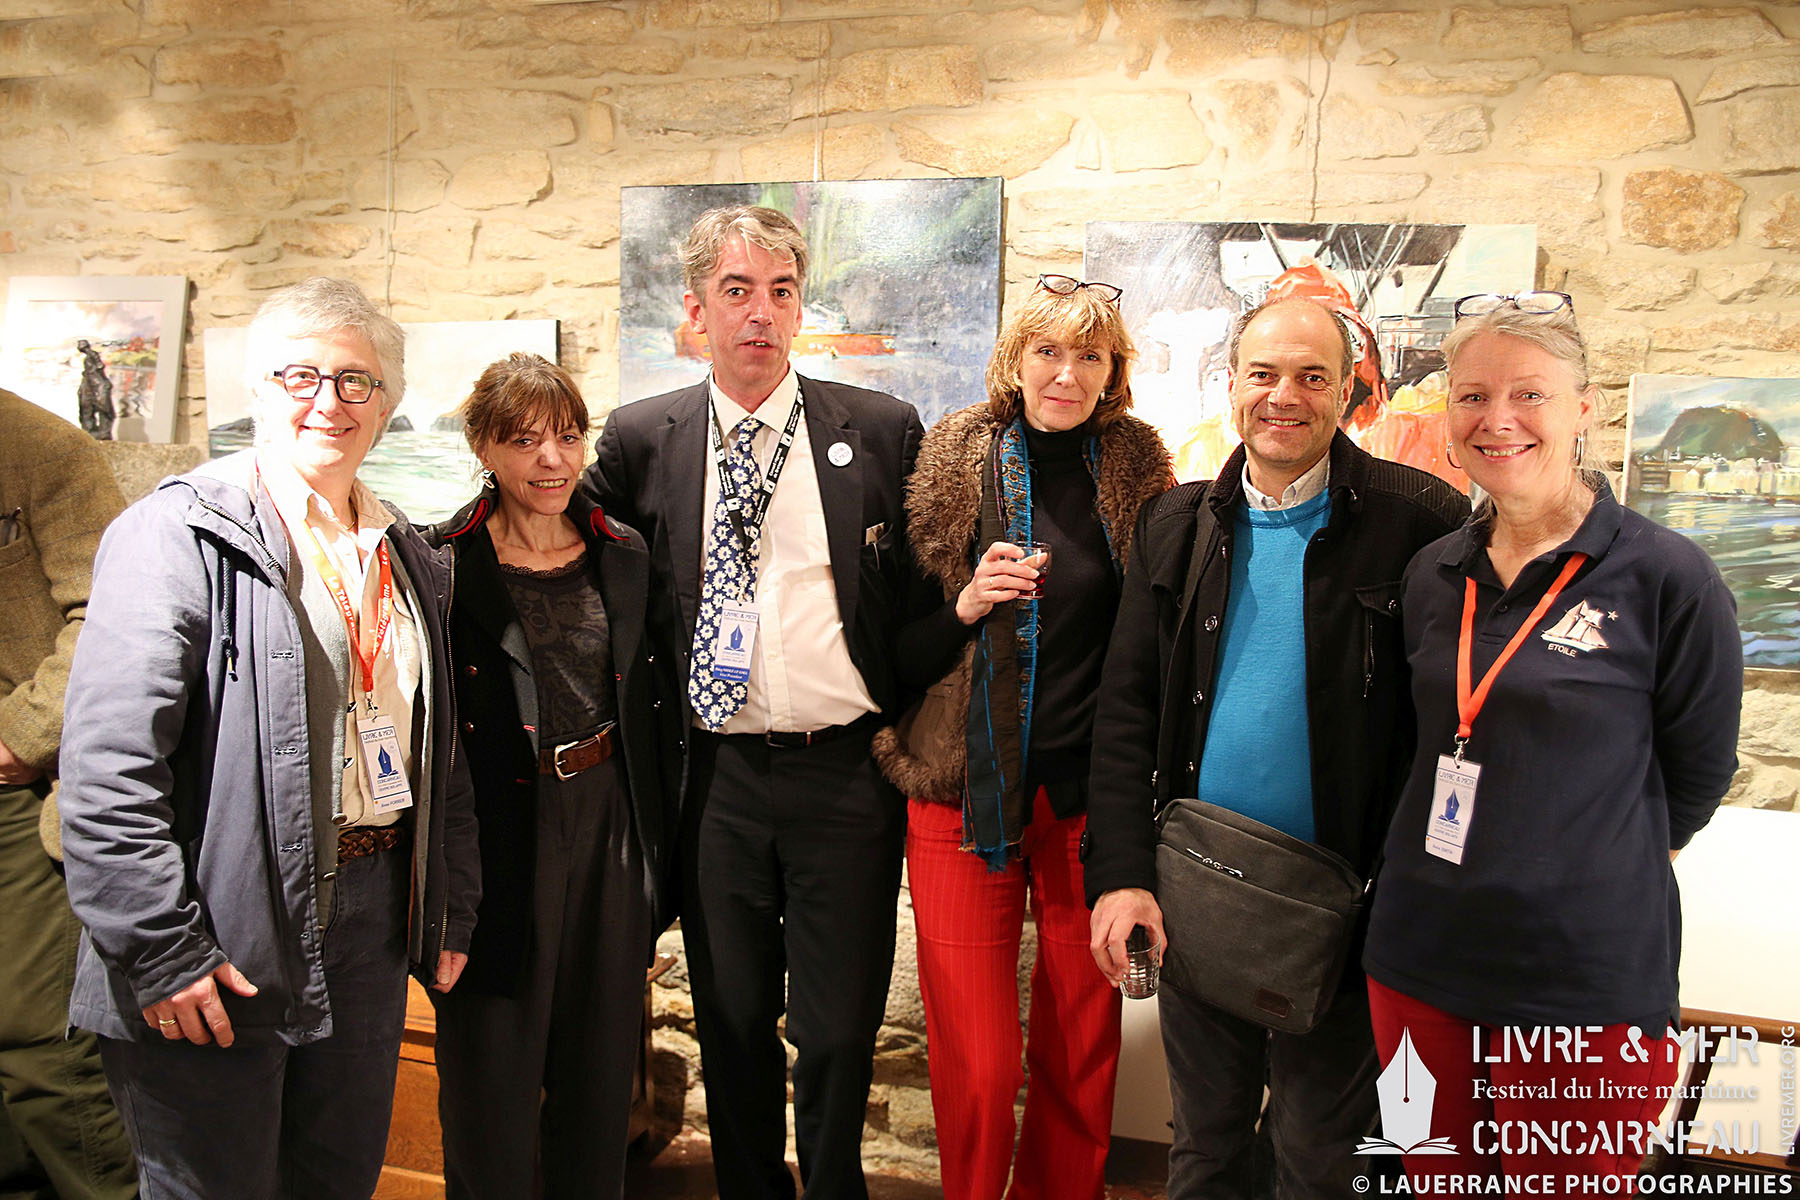 Anne Forrer, Ève Tharlet, BHLG, Brigitte Luciani, Florent Patron & Anne Smith © Lauerrance Photographies